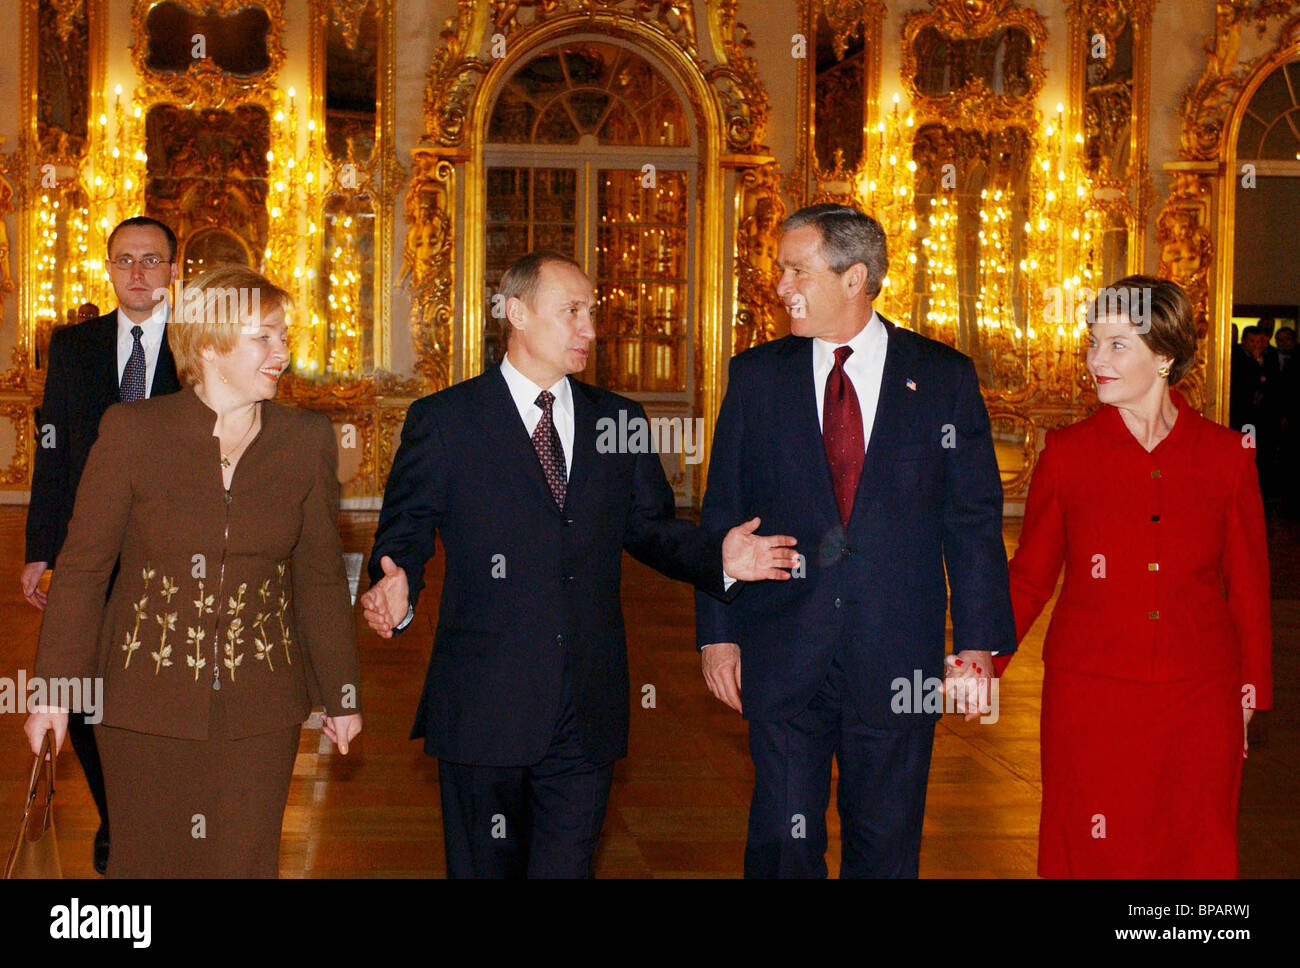 Putin and Bush at the Catherine Palace - Stock Image